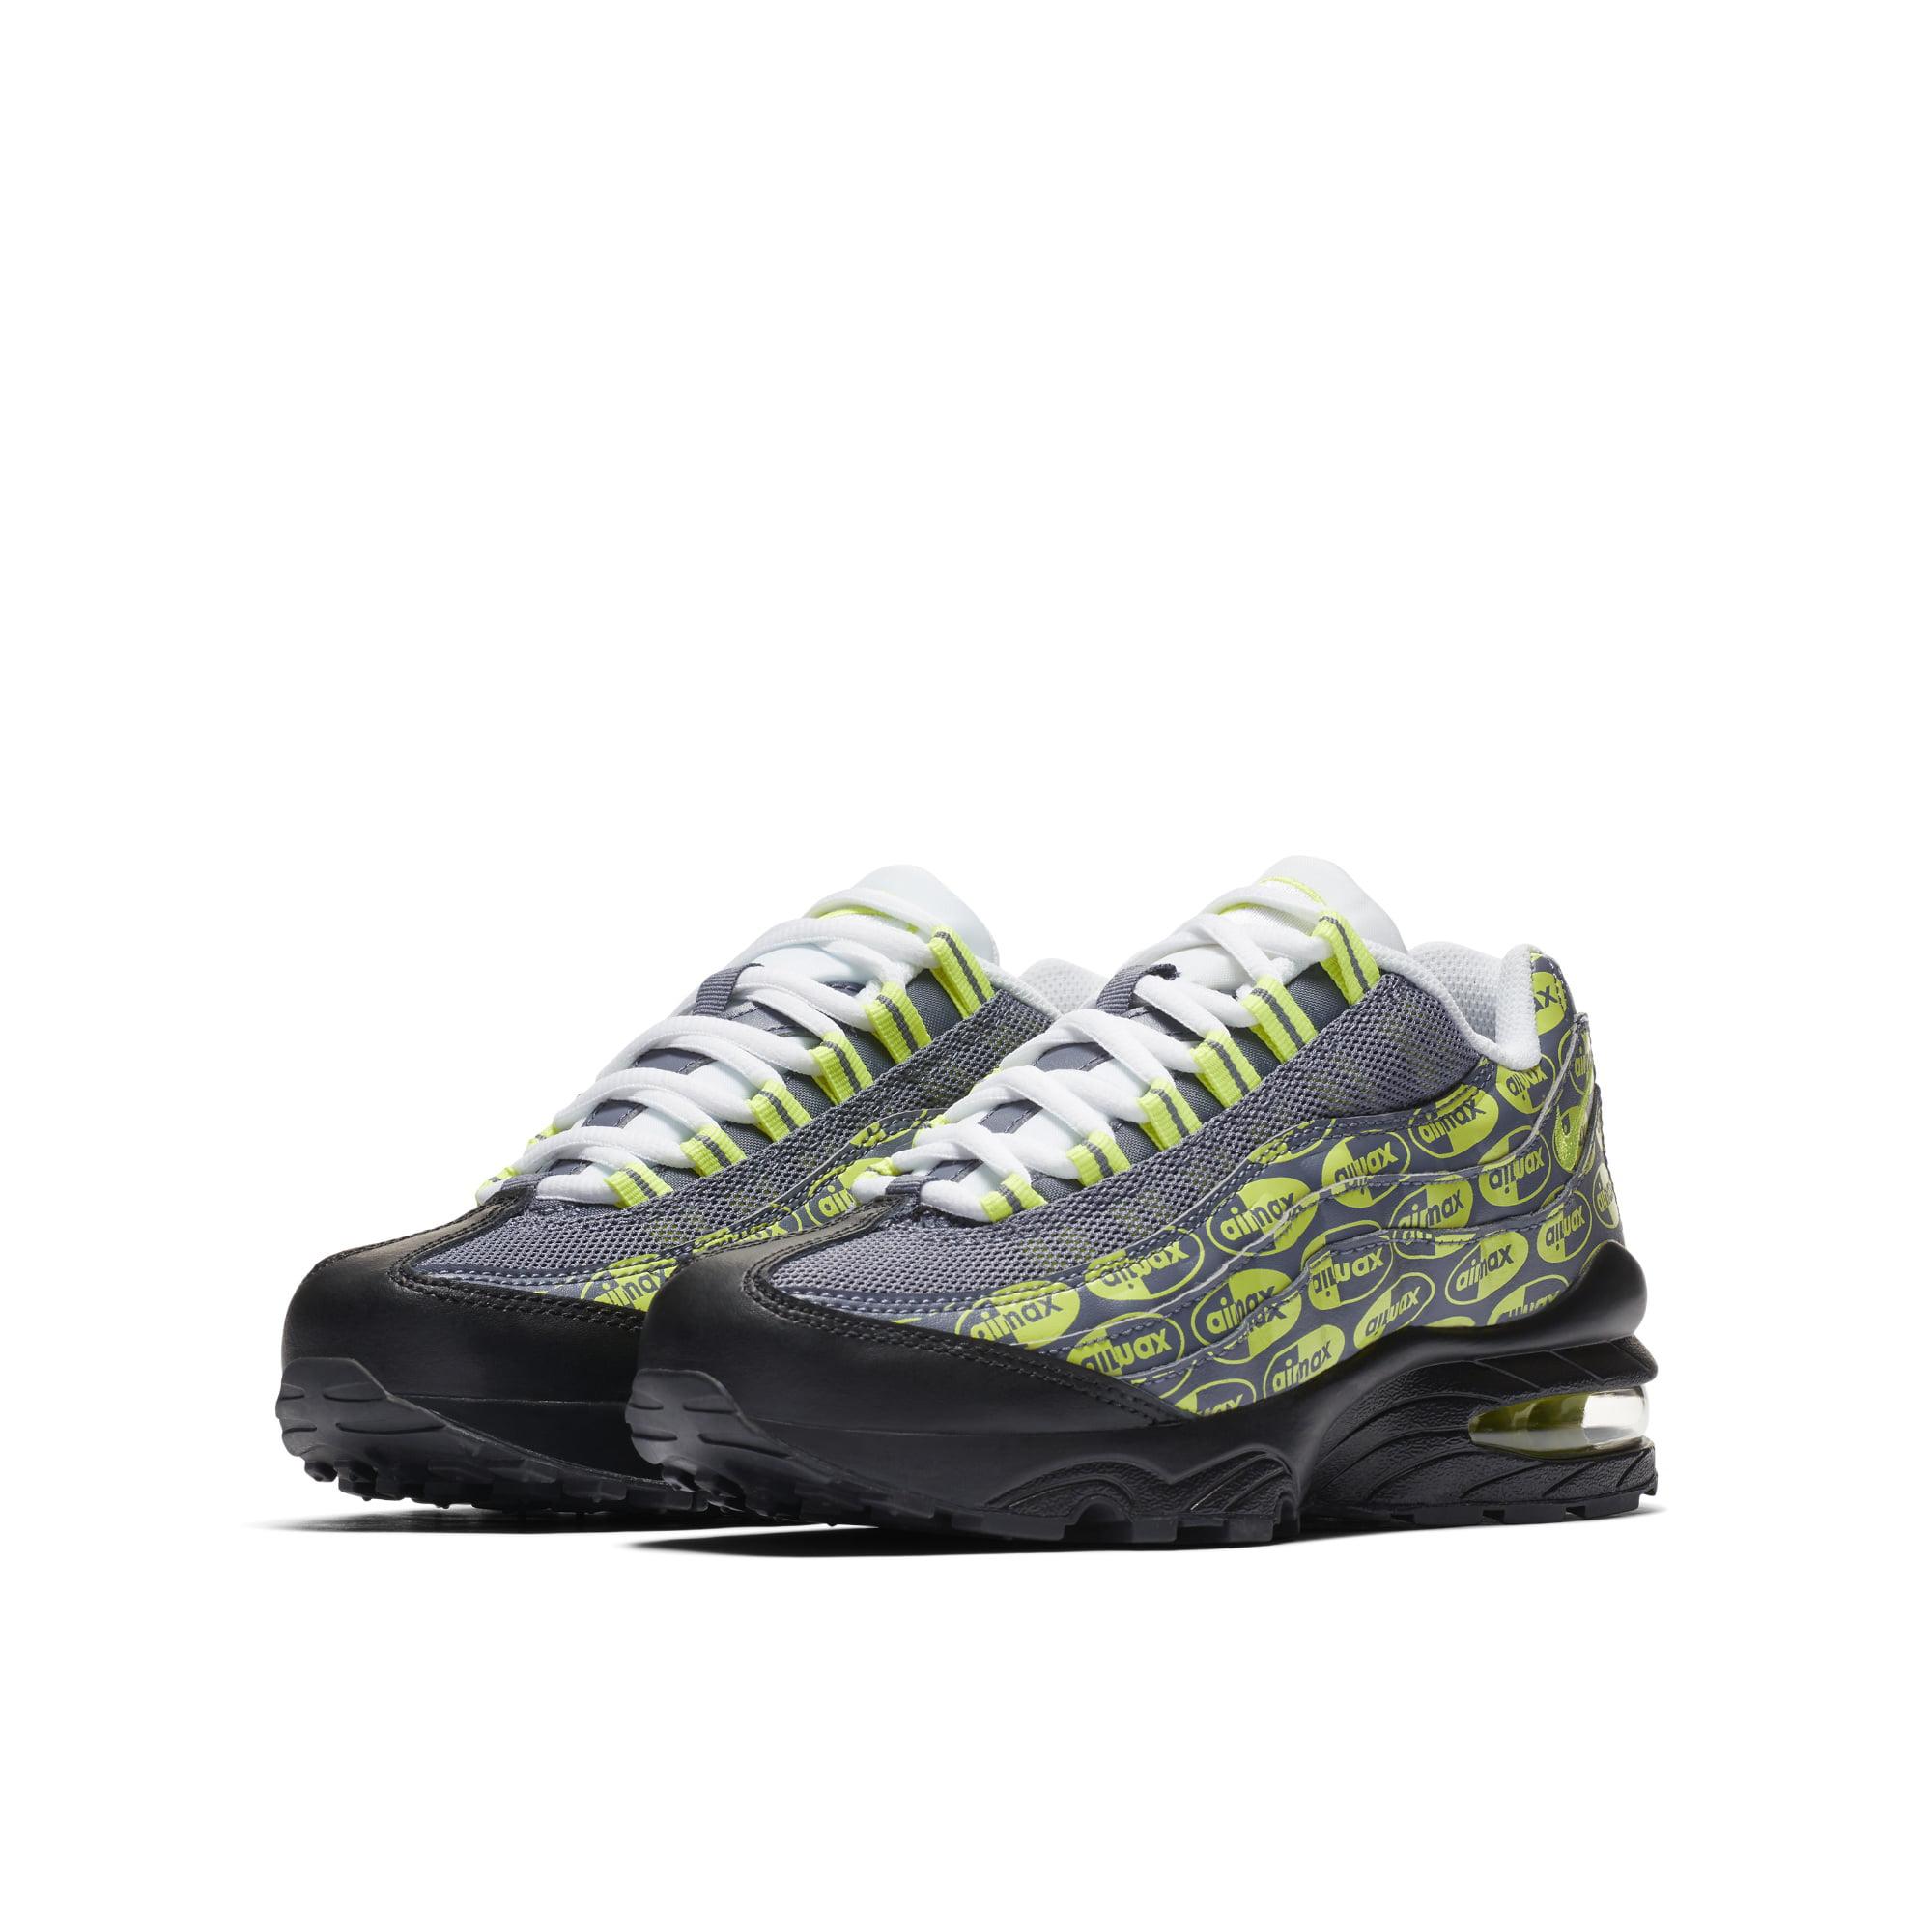 Nike - NIKE AIR MAX 95 SE (GS) BOY'S SNEAKERS 922173-004 - Walmart.com